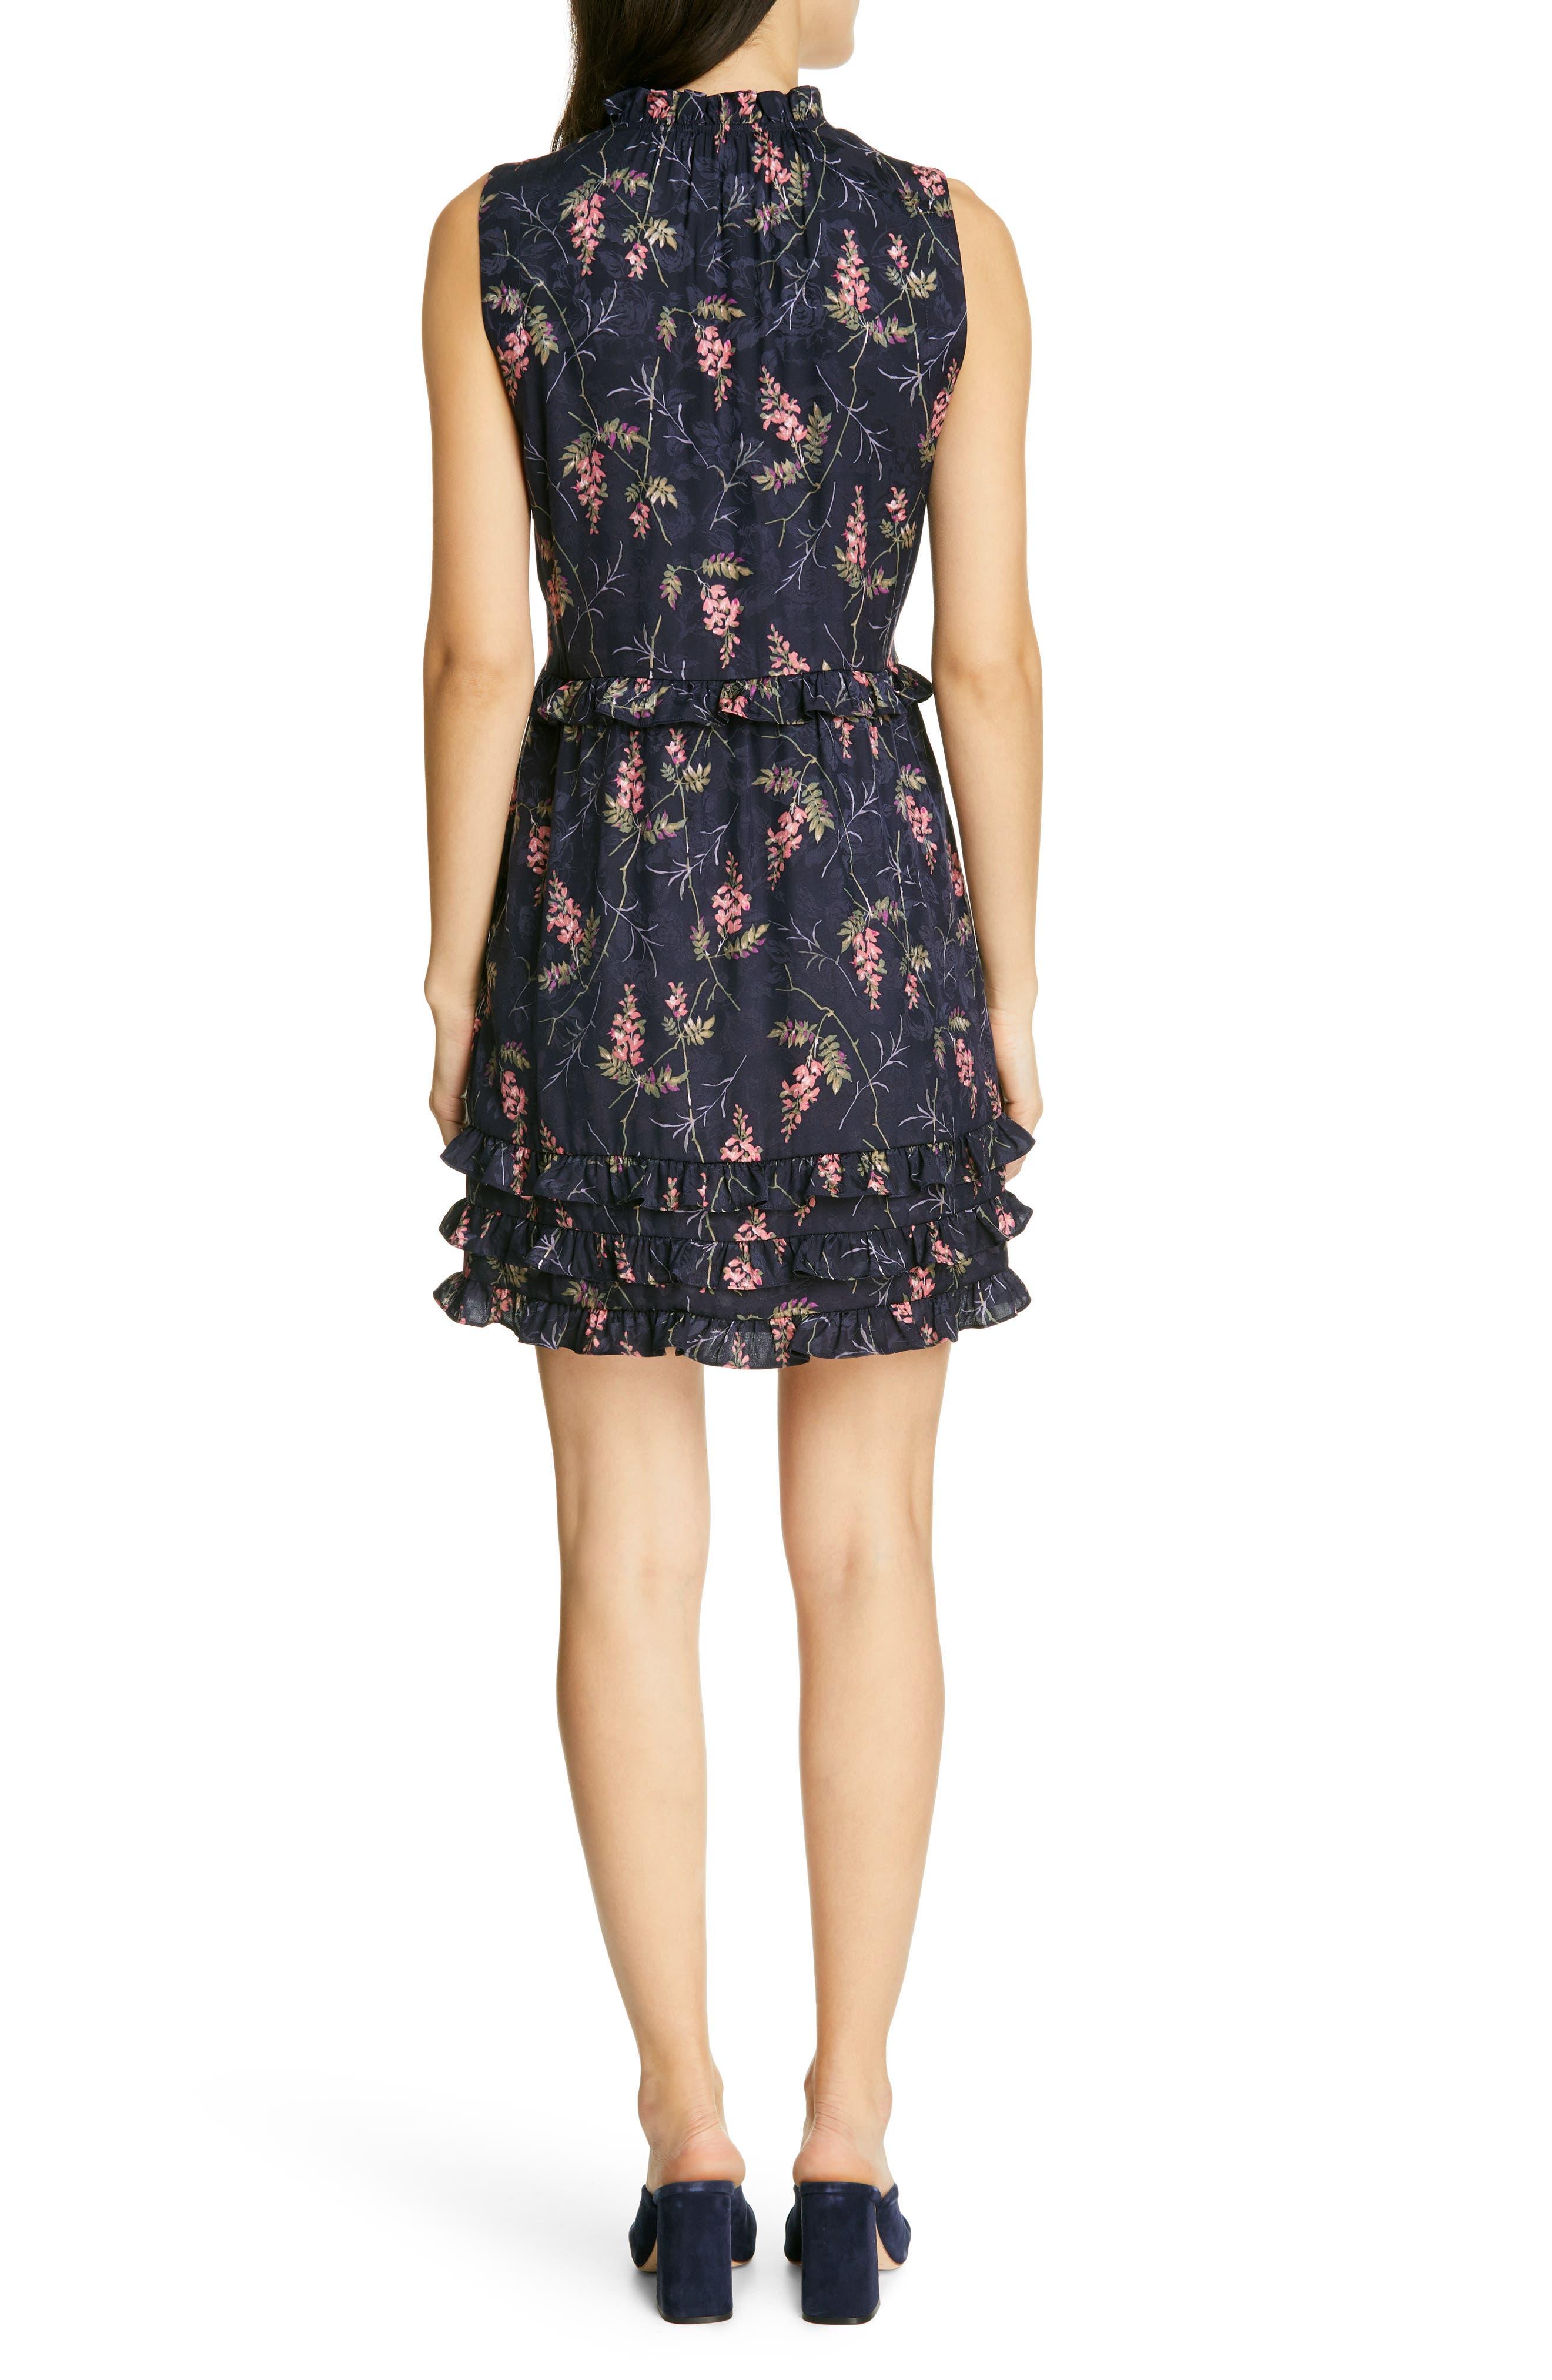 REBECCA TAYLOR, Ivie Floral Ruffle Silk Blend Dress, Alternate thumbnail 2, color, NAVY COMBO